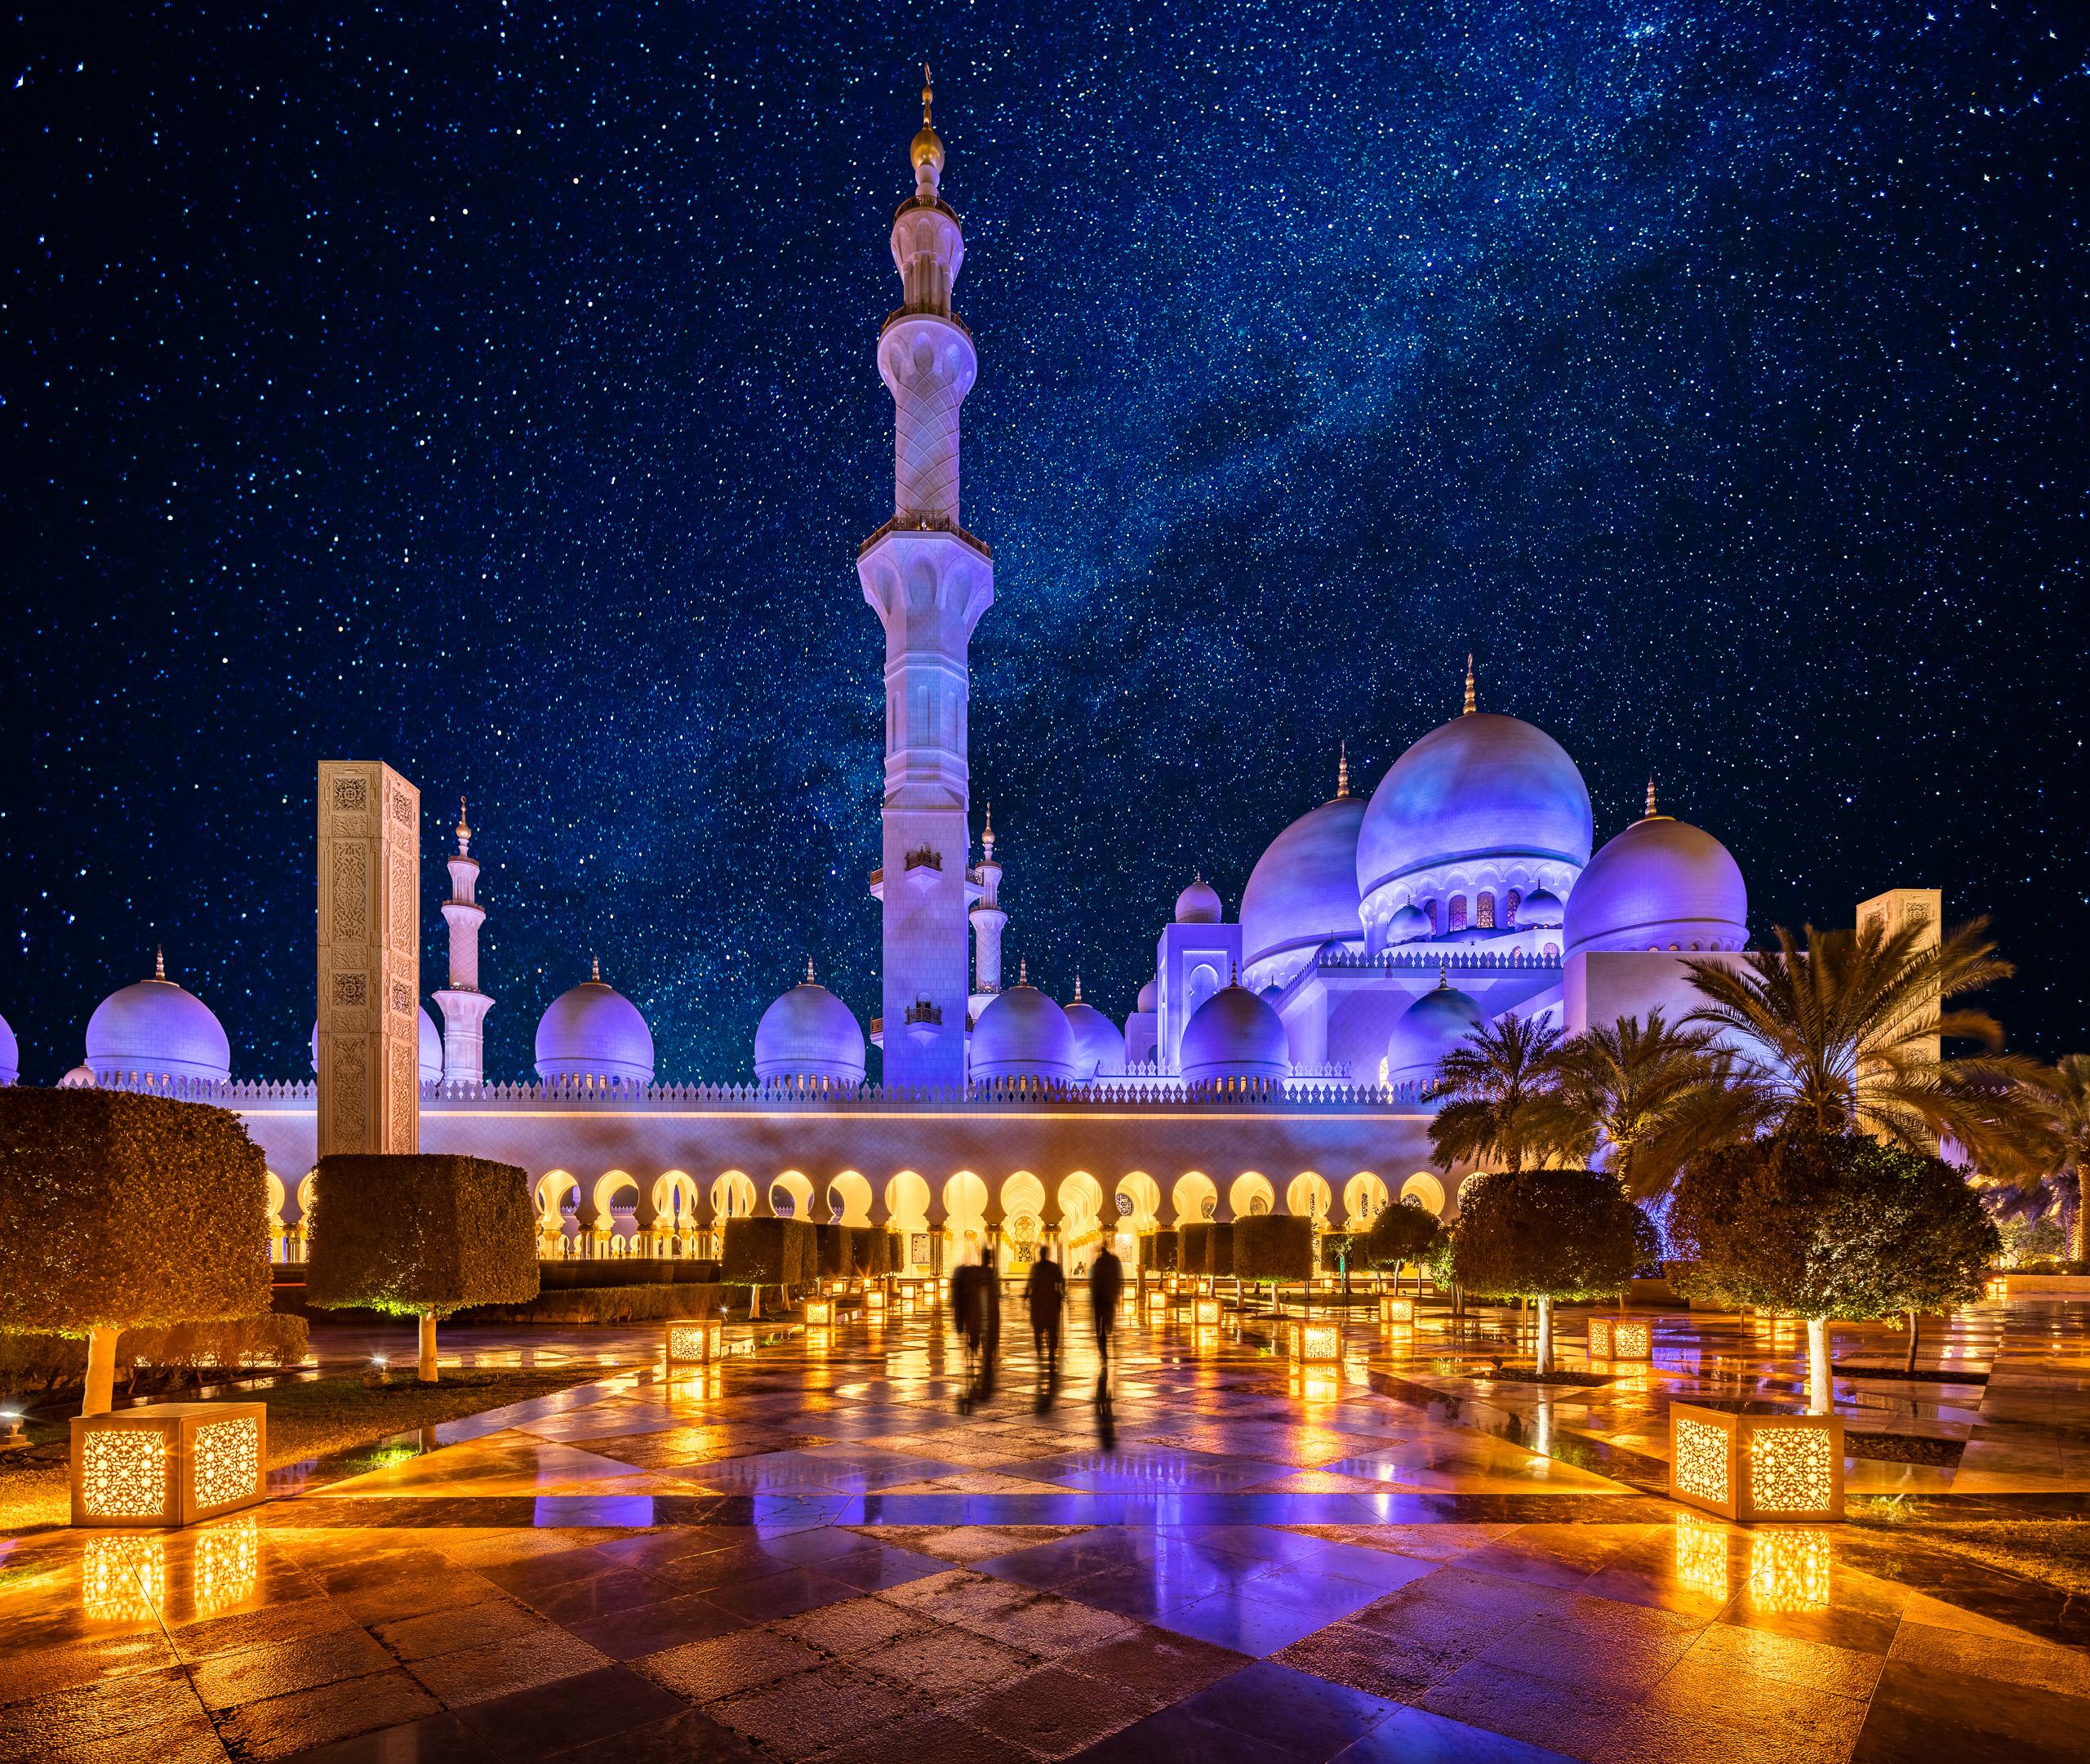 01-Fotograf-Andreas-Martin-Stuttgart-Photography-Abu-Dhabi-Dubai-mosque-sheik-zayed-szgmc-architecture-sky-night